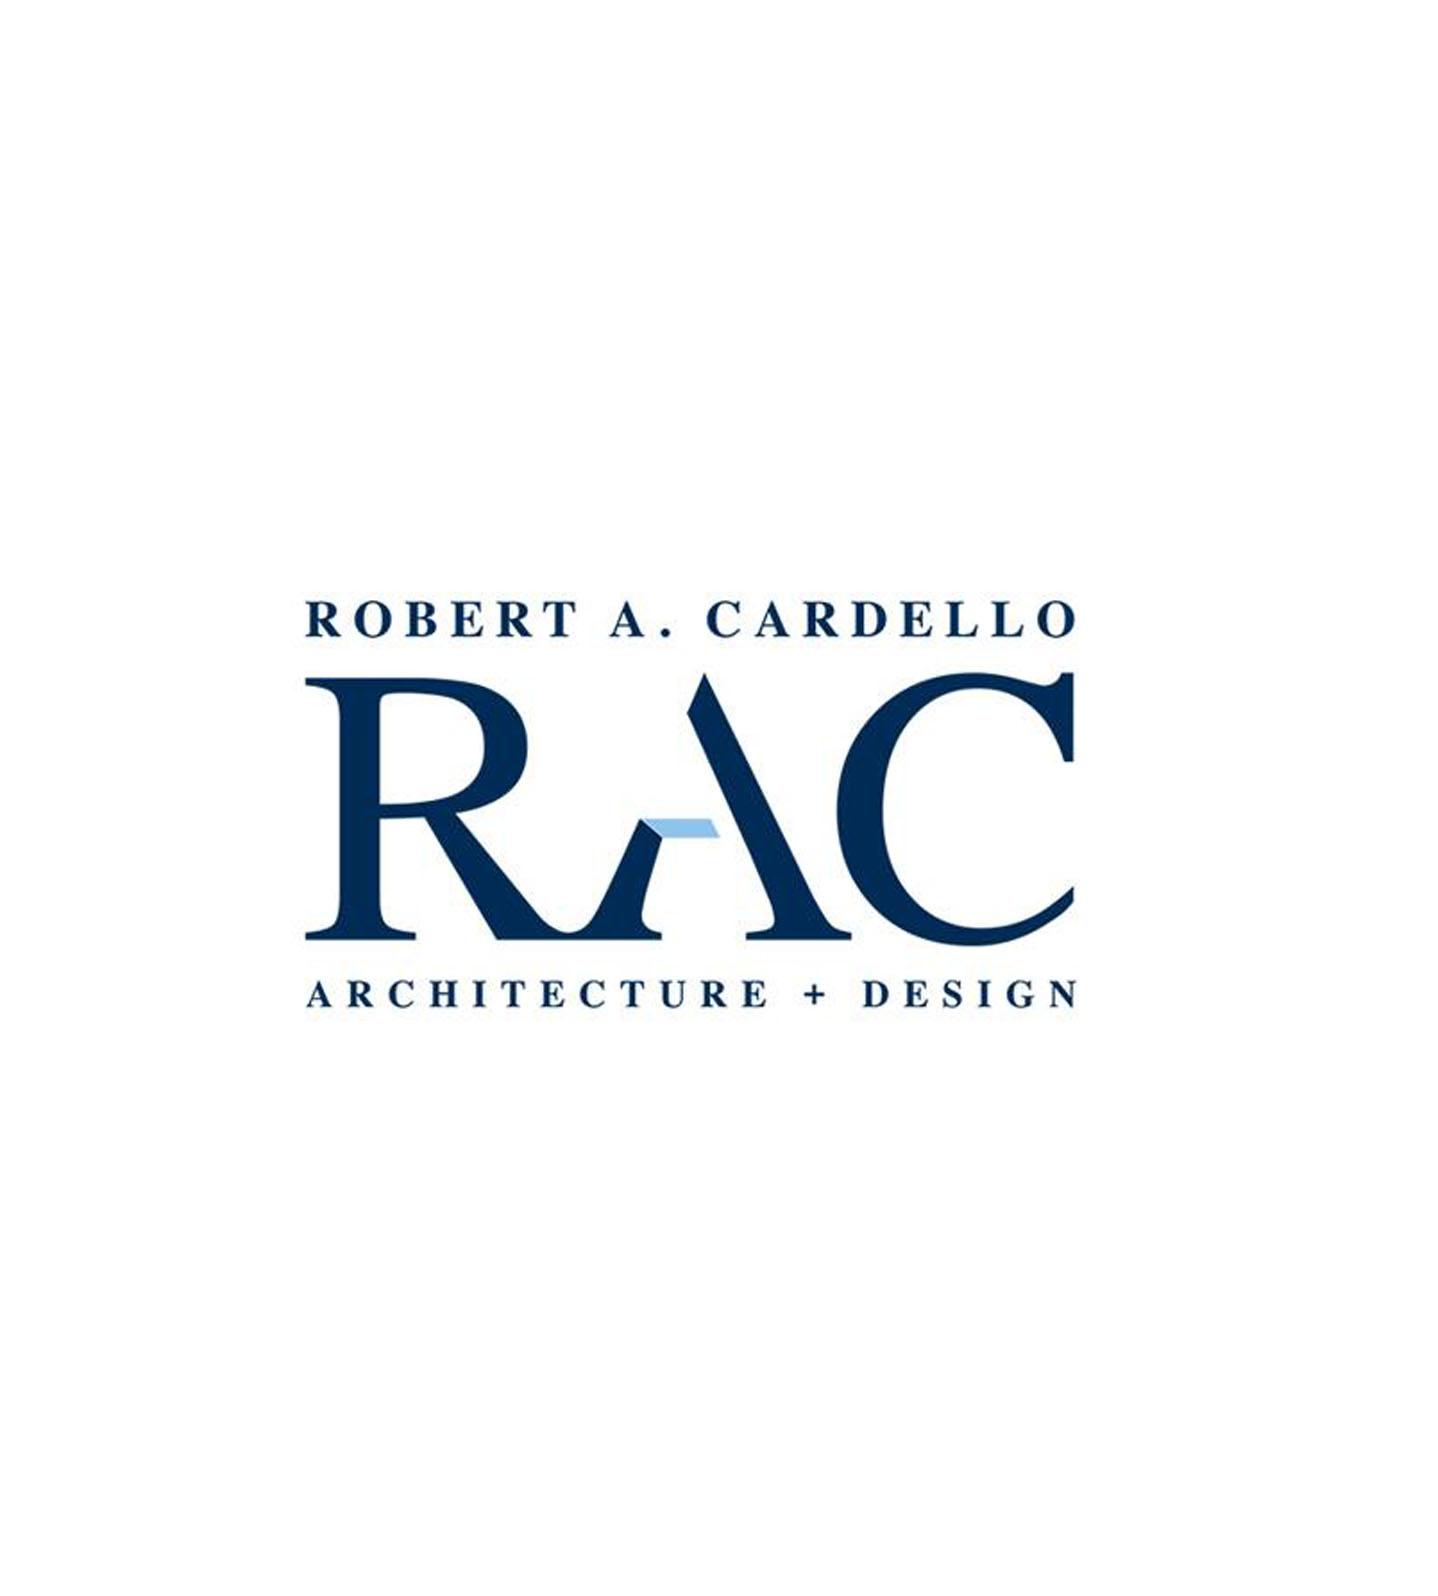 ROBERT CARDELLO ARCHITECTS